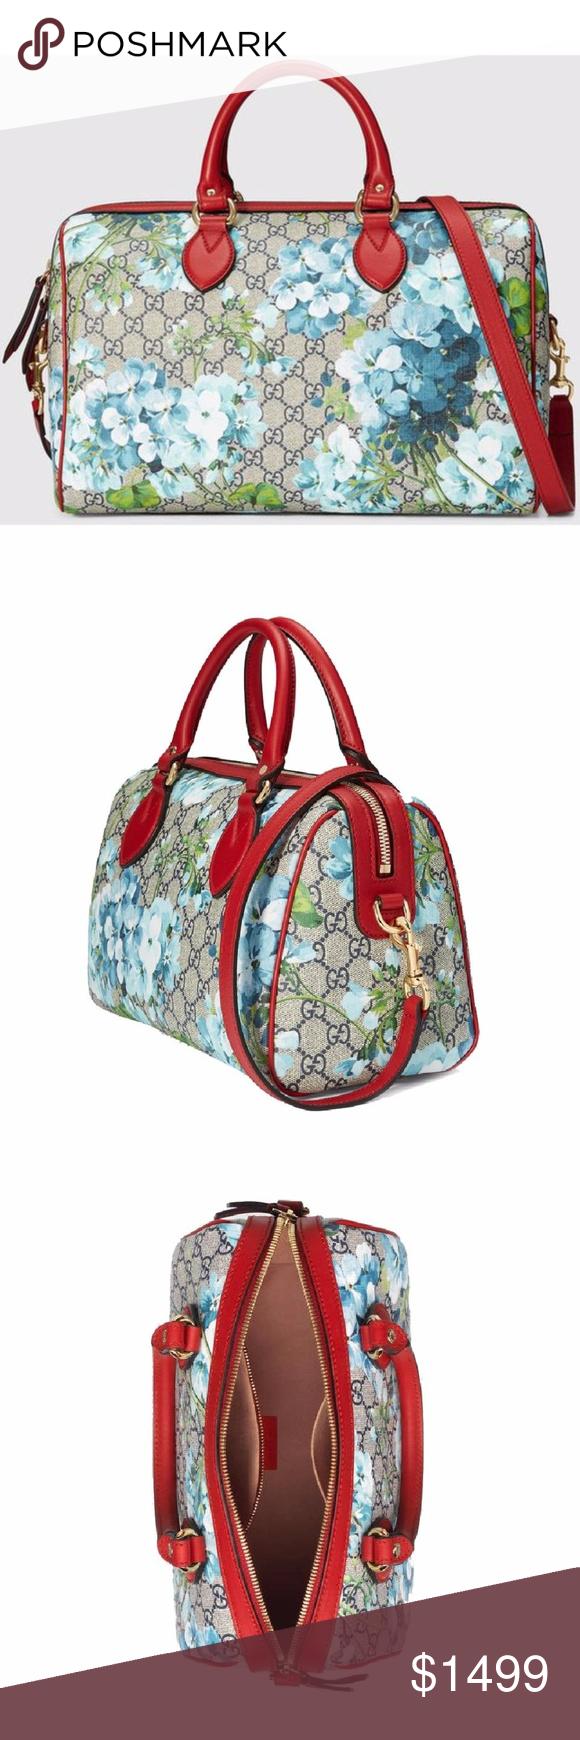 e5942bc95dc5 Gucci Blooms GG Supreme Top Handle Boston Bag Blooms print GG Supreme  canvas, made using